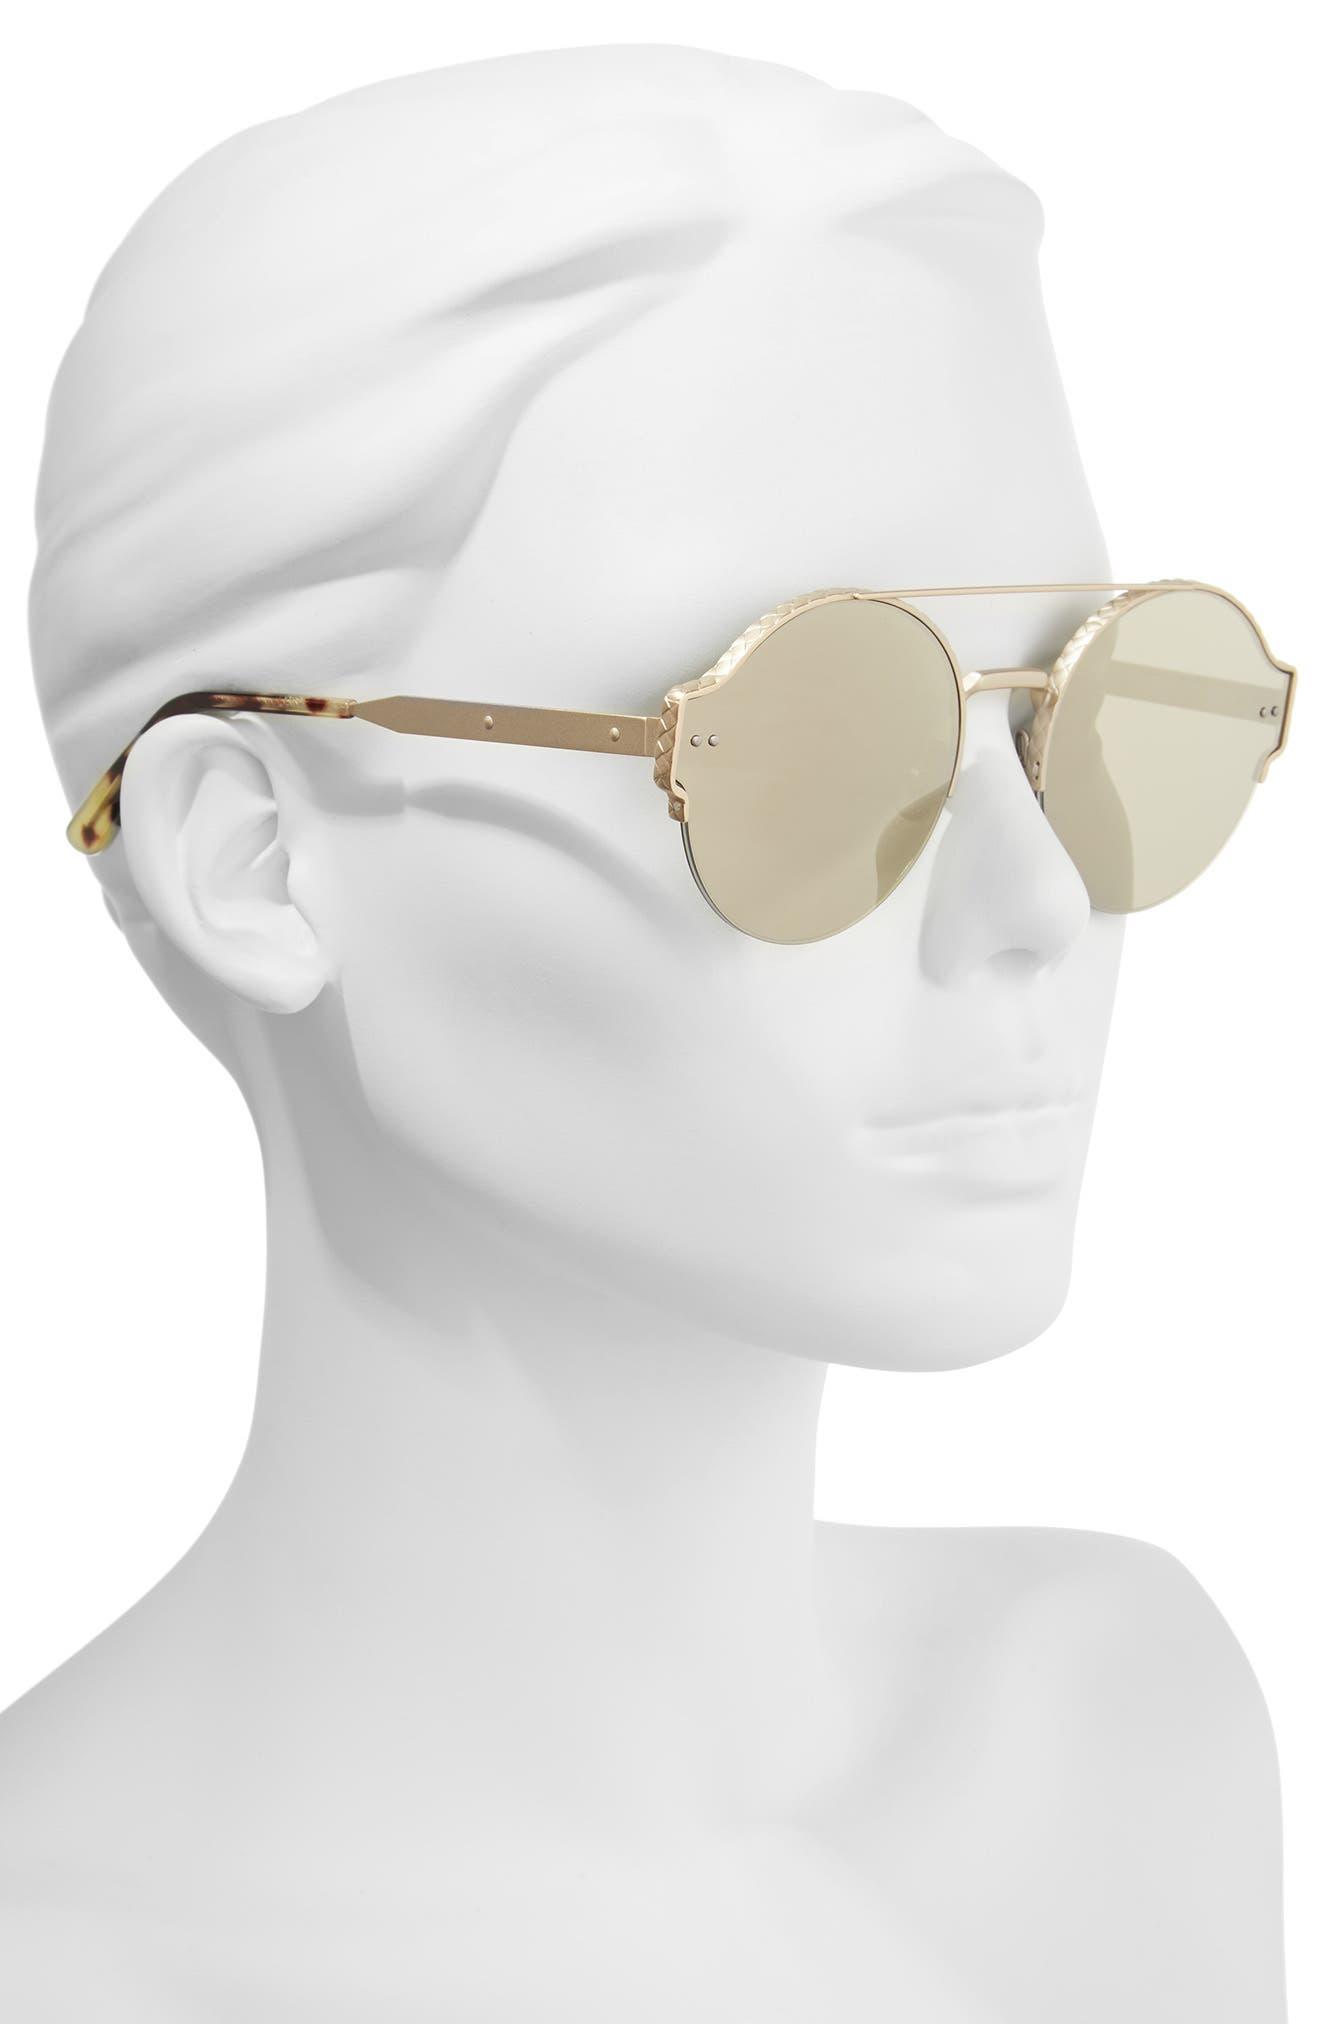 54mm Round Semi-Rimless Sunglasses,                             Alternate thumbnail 5, color,